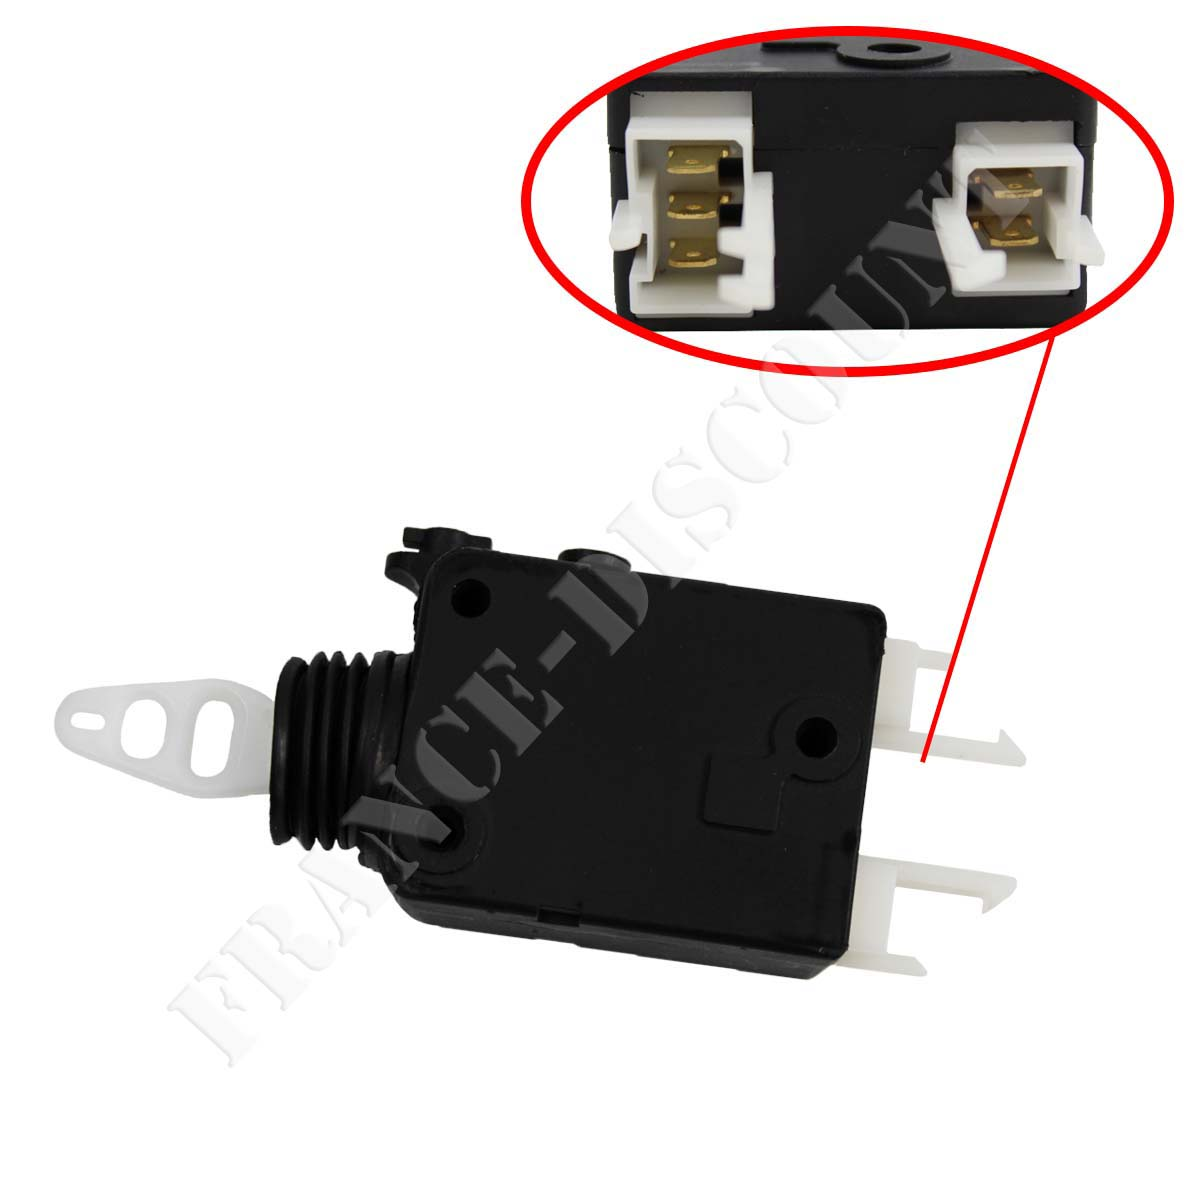 motor cierre centralizado citroen ax berlingo bx saxo zx 661503. Black Bedroom Furniture Sets. Home Design Ideas